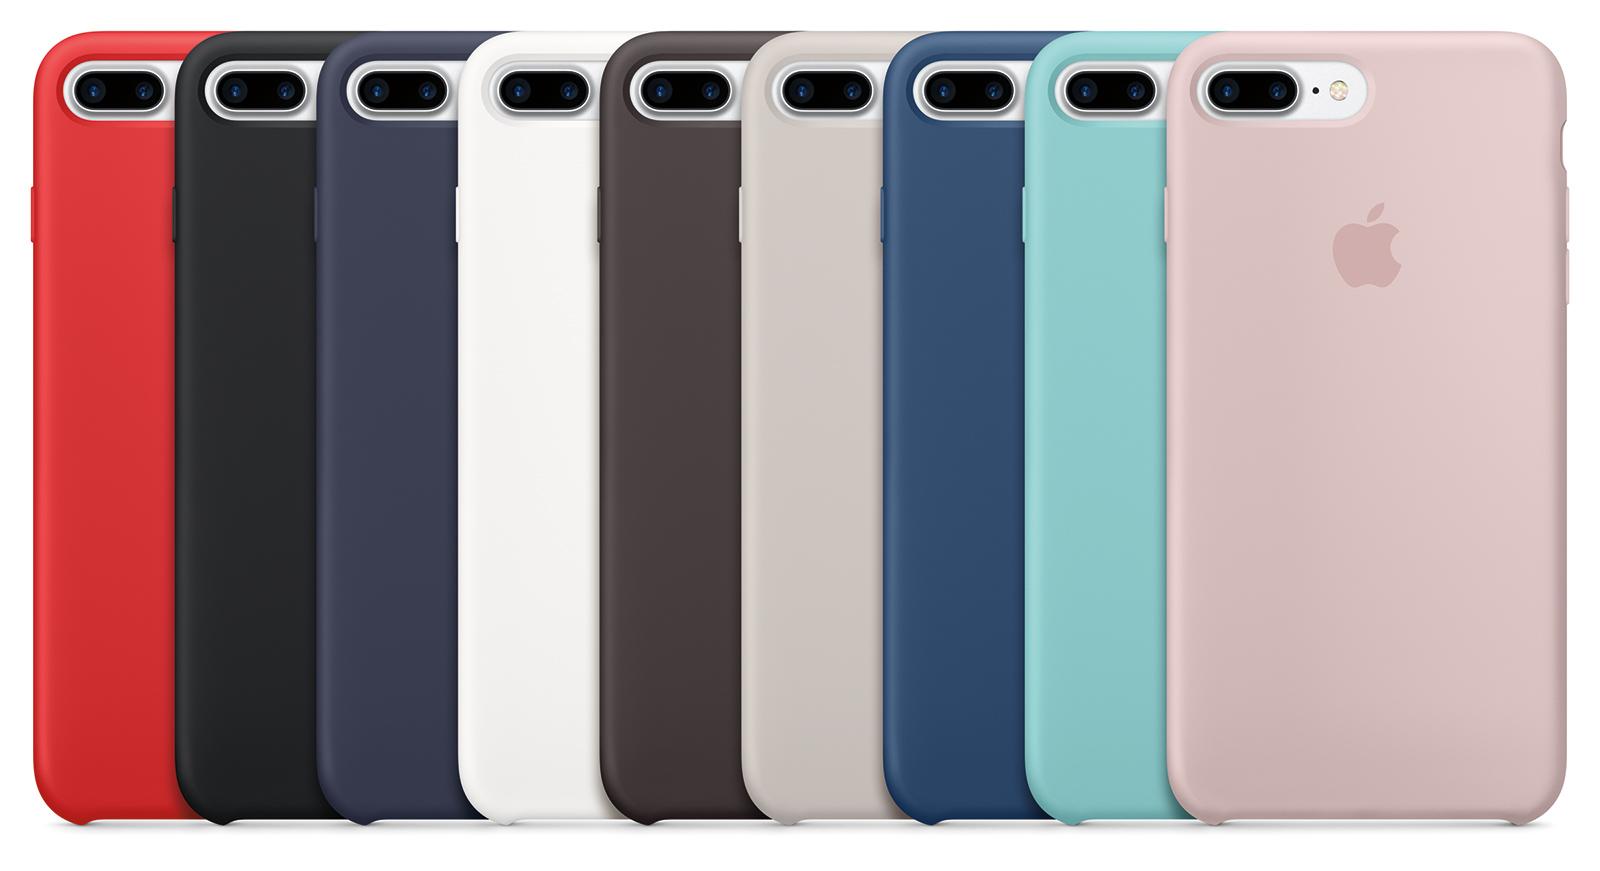 iphone 7s plus lanzamiento